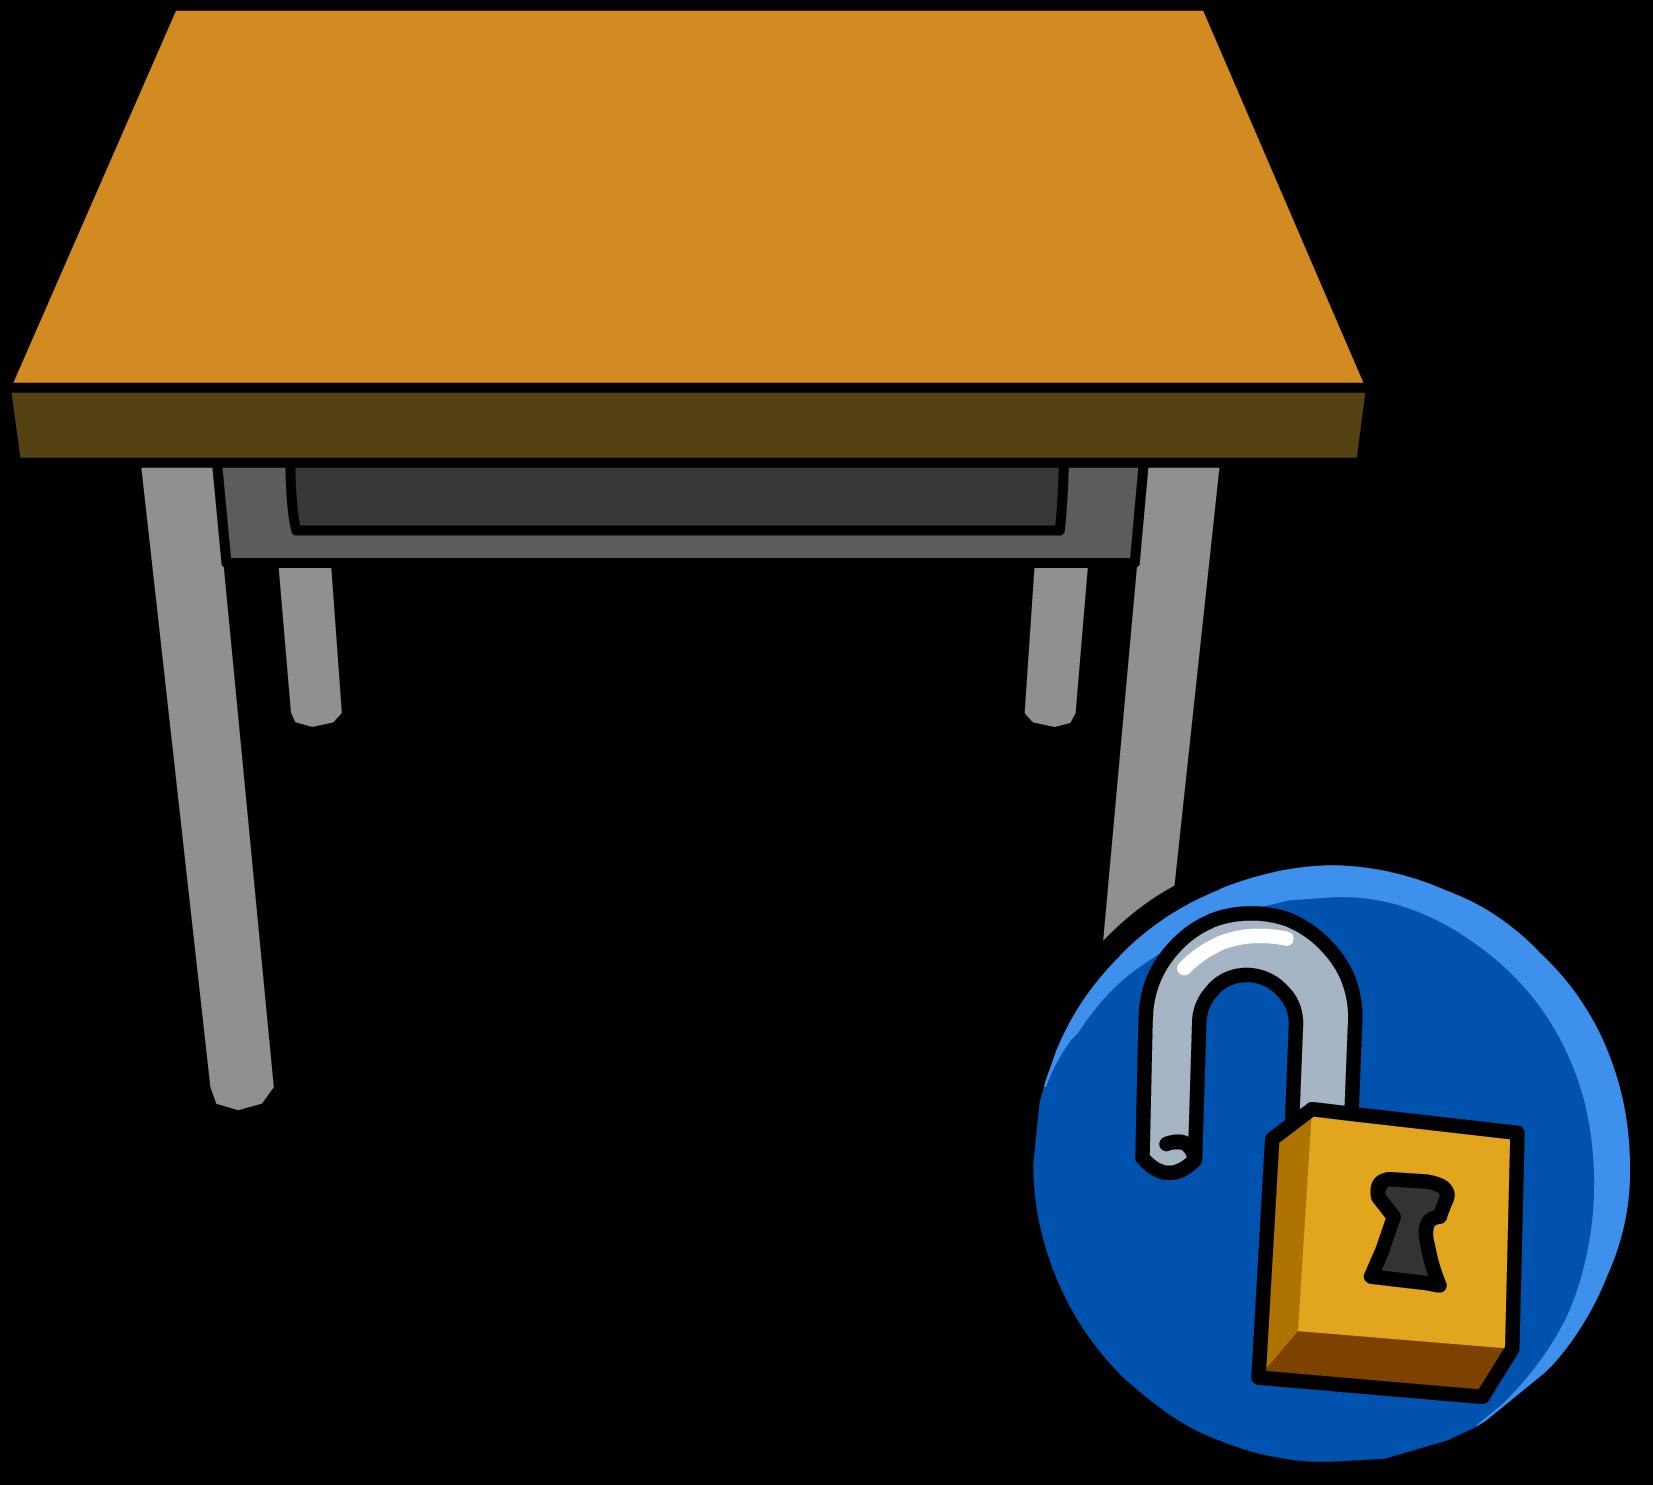 School desks clipart picture library download Classroom Desk | Club Penguin Wiki | FANDOM powered by Wikia picture library download